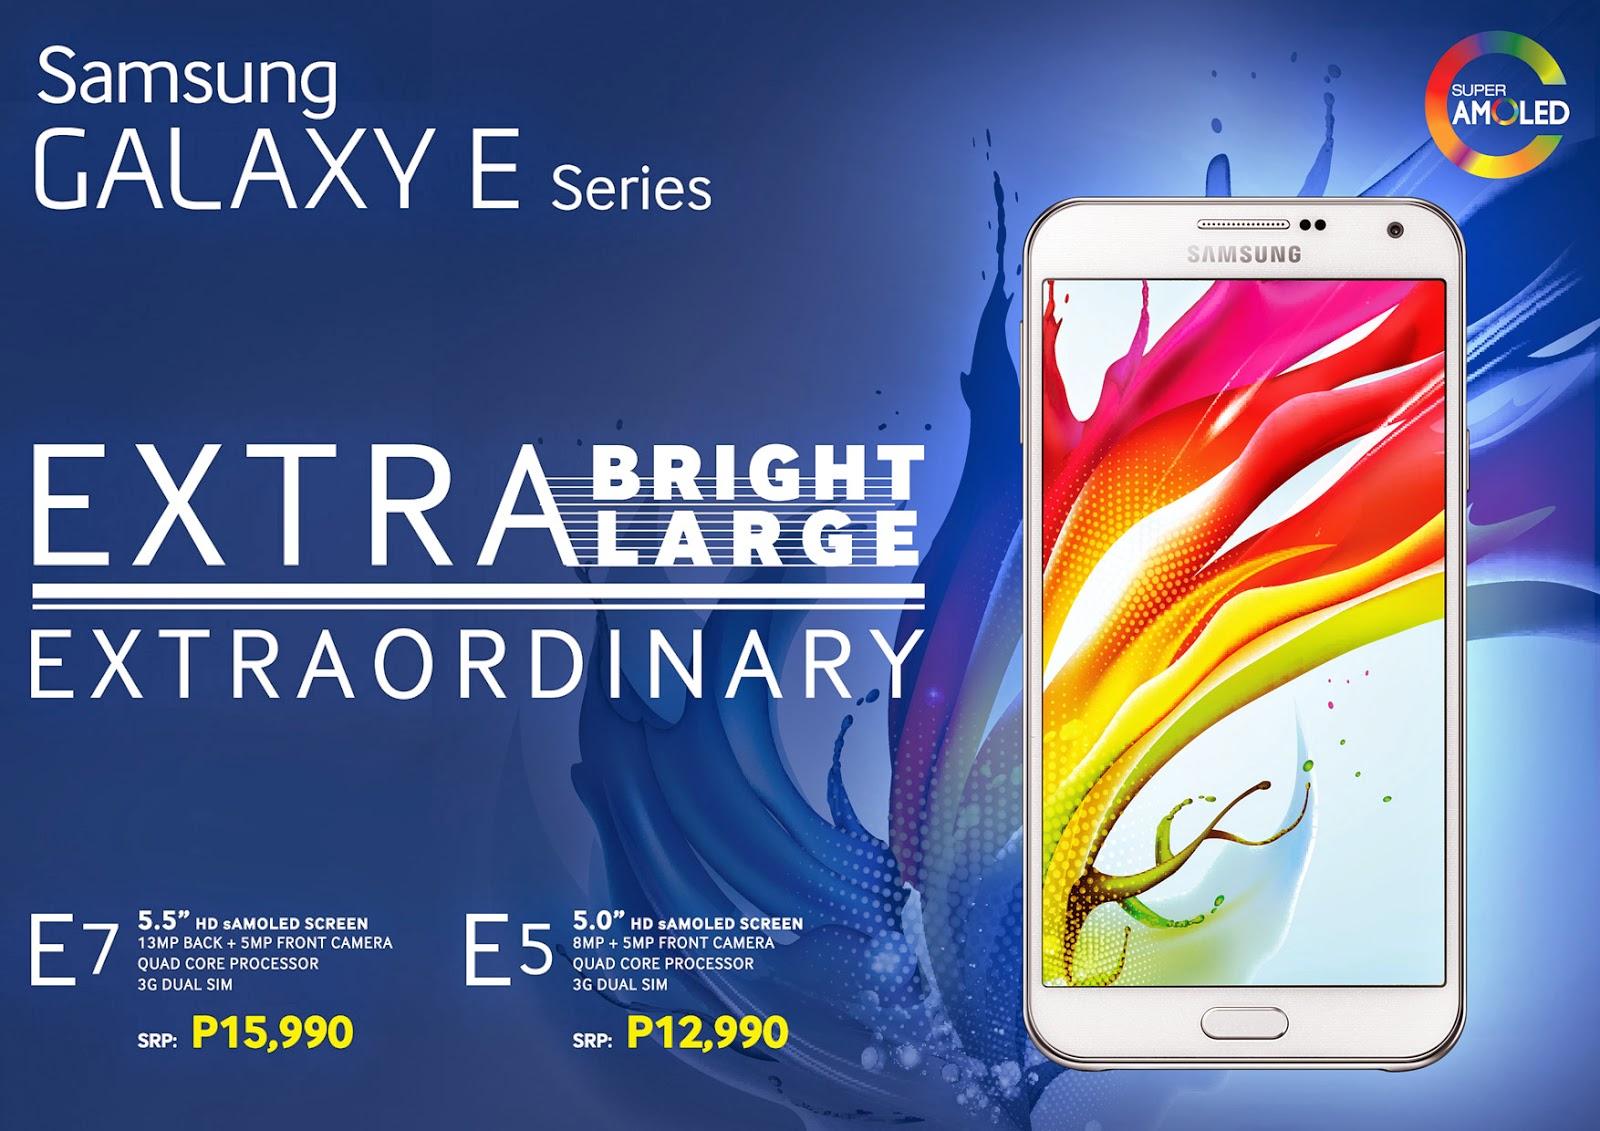 Samsung Galaxy E Series Promo